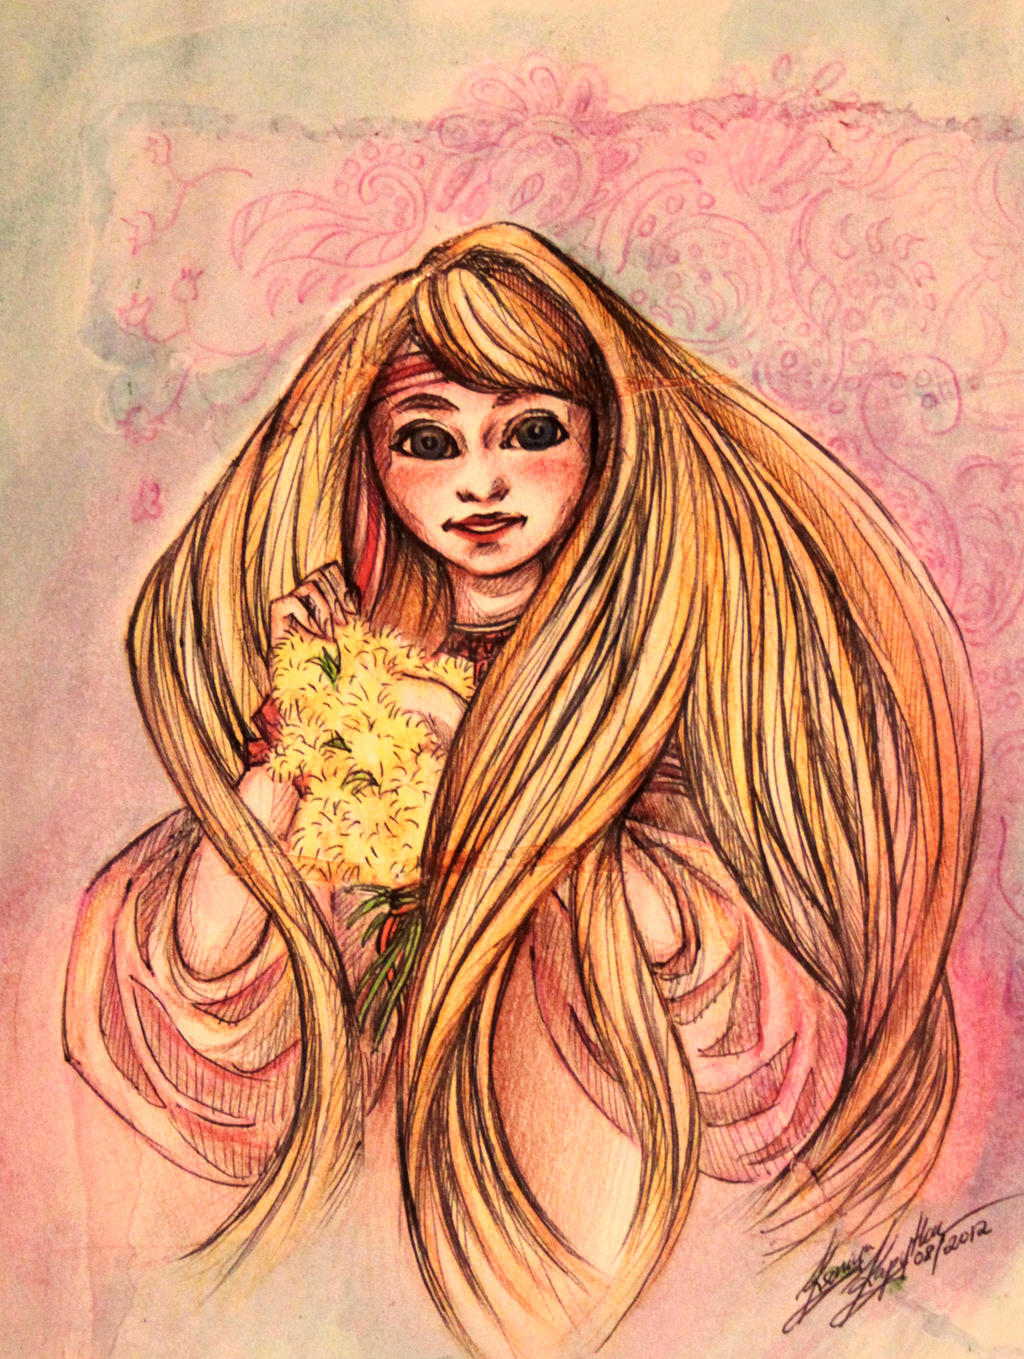 Dandelions by Sushki